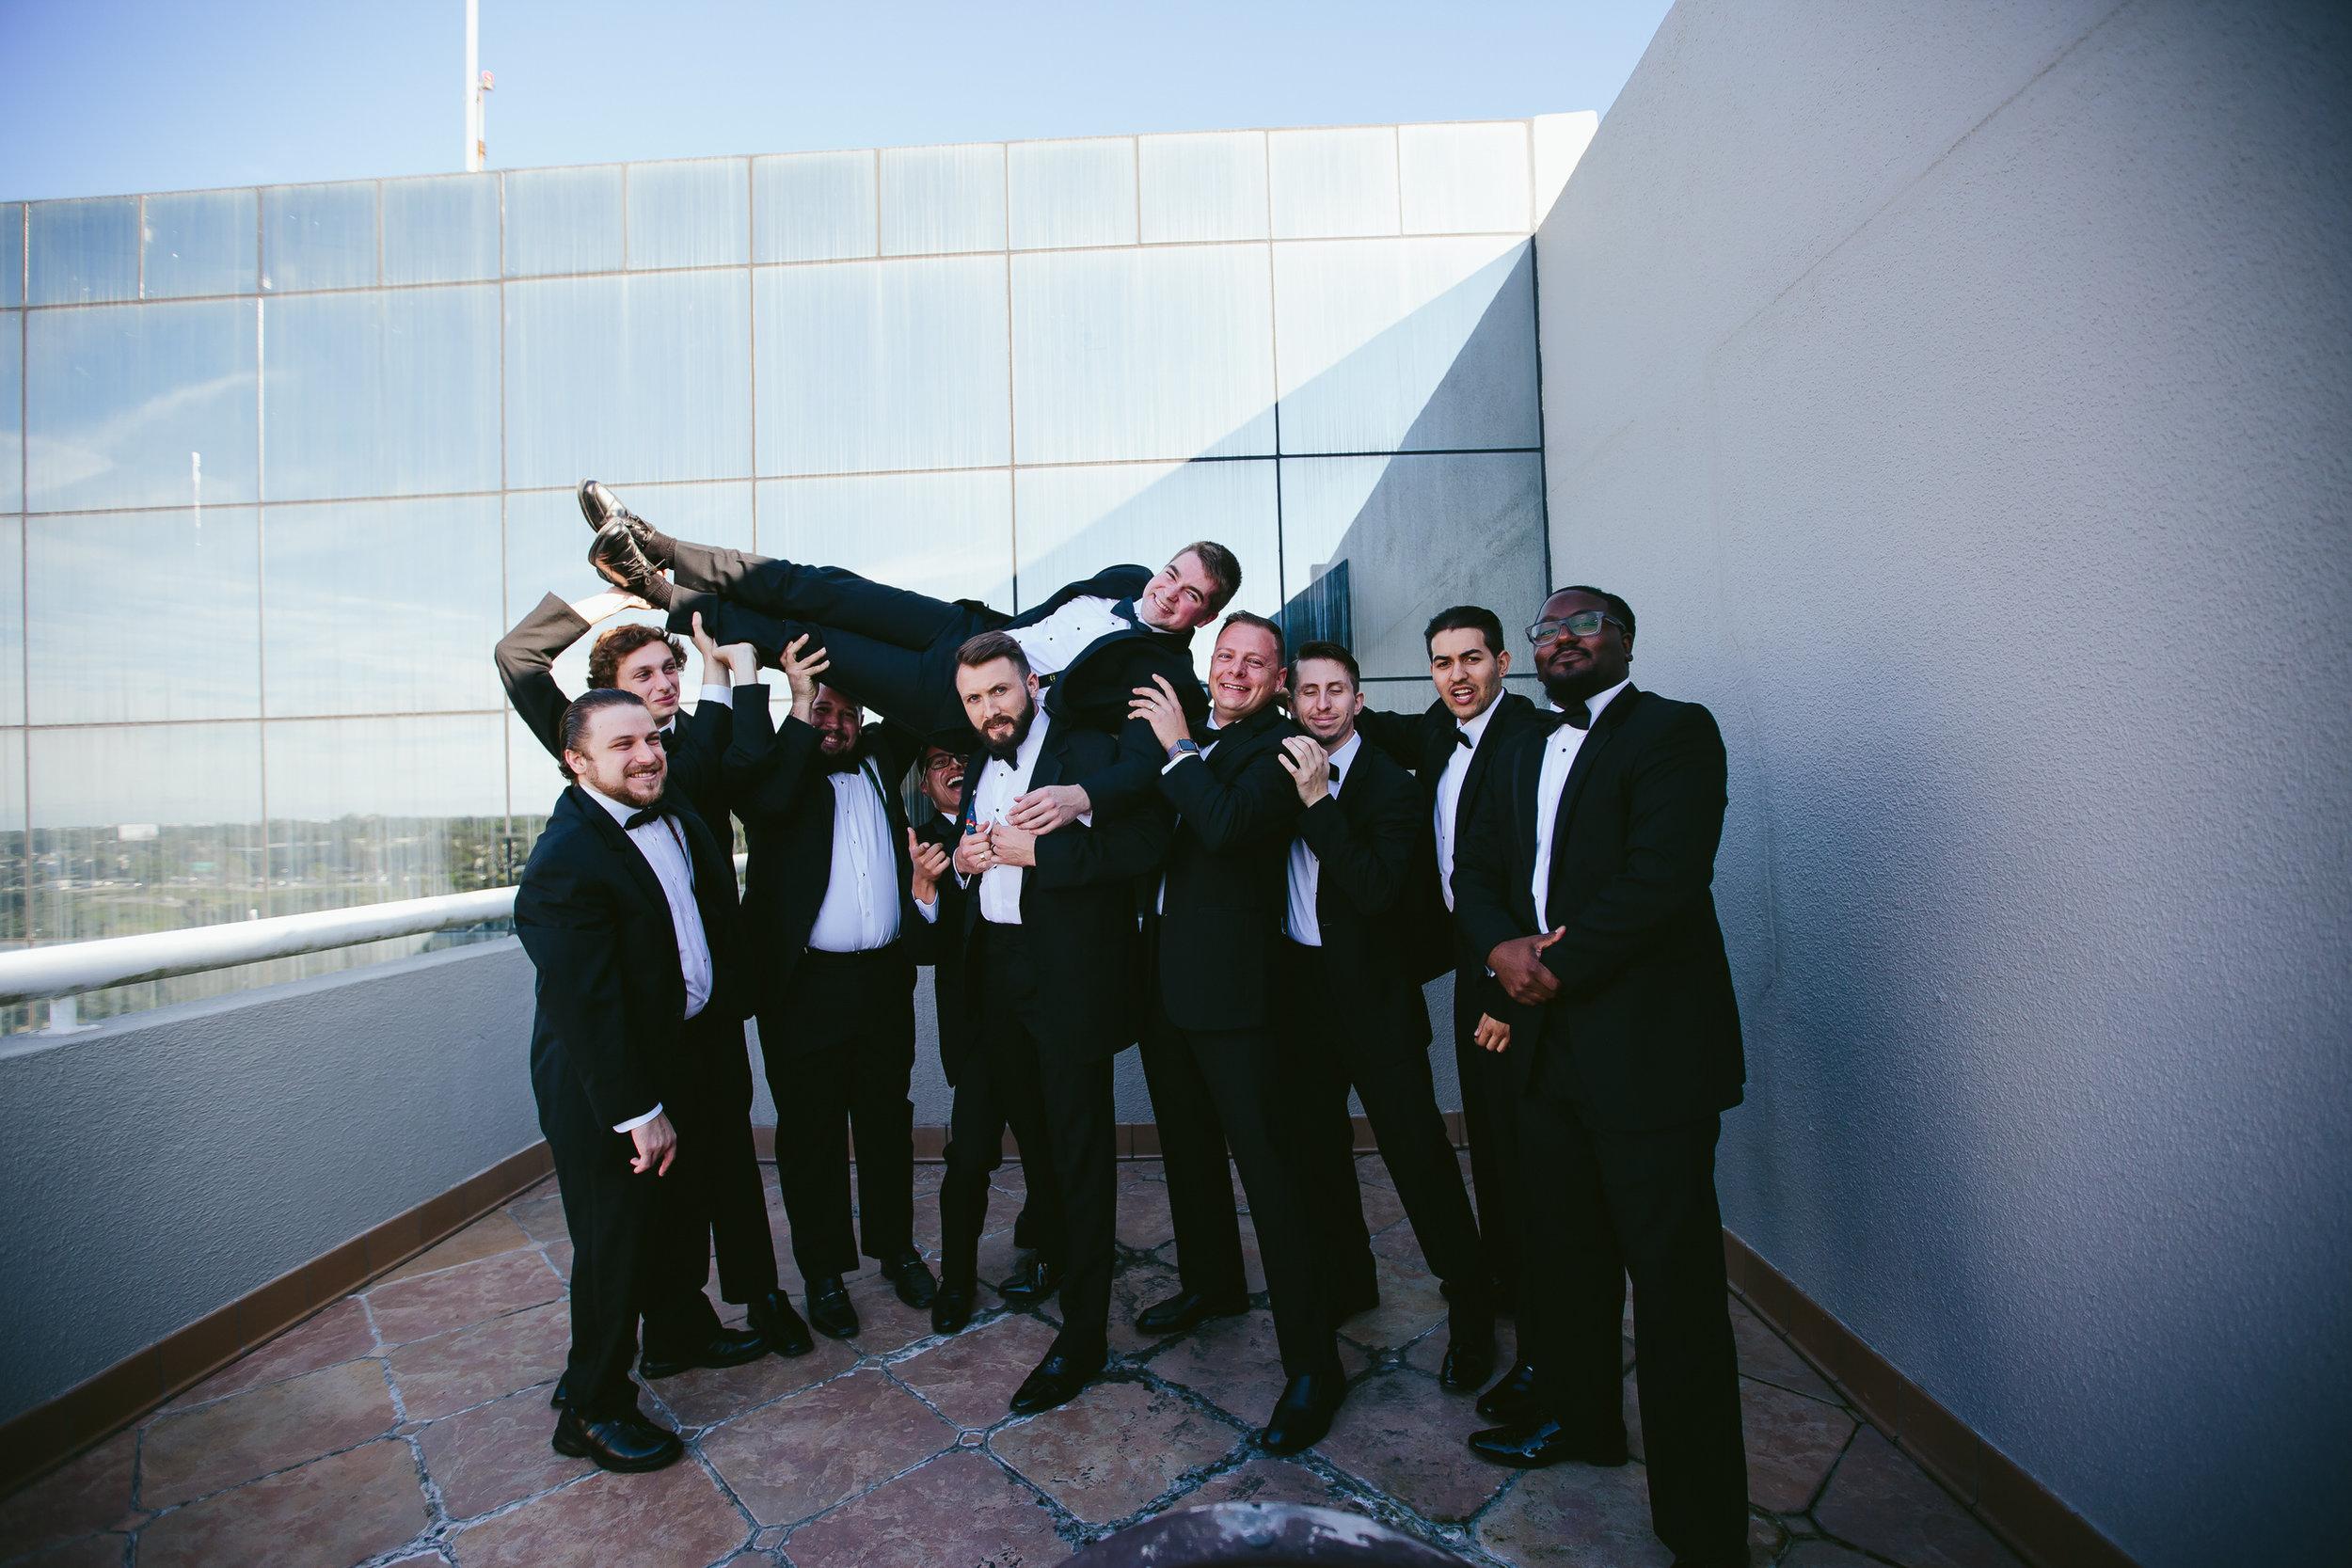 groomsman_being_silly_fun_viral_wedding_photo_tiny_house_photo.jpg